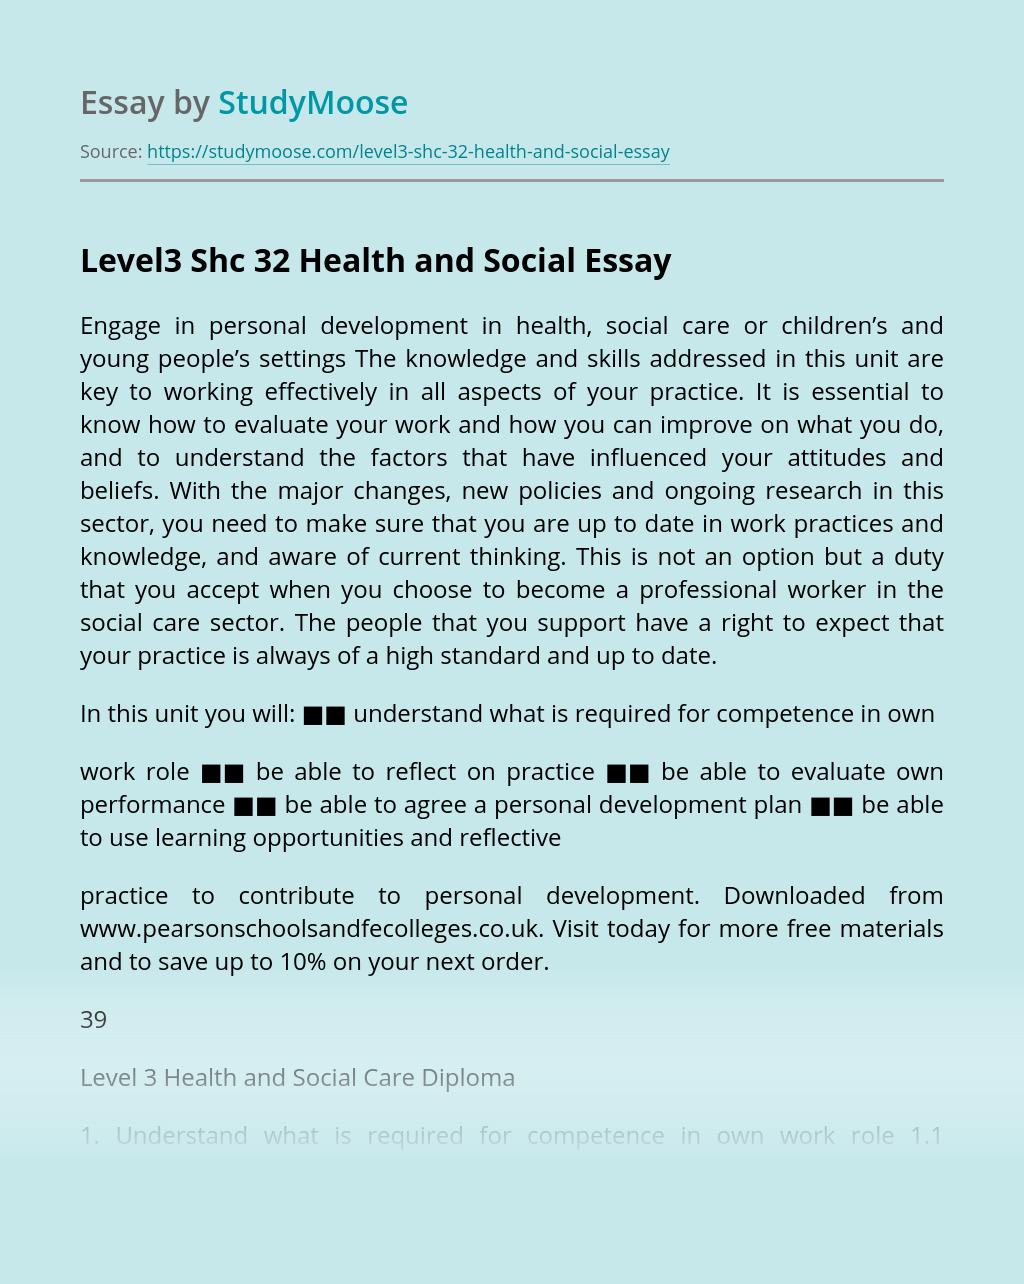 Level3 Shc 32 Health and Social